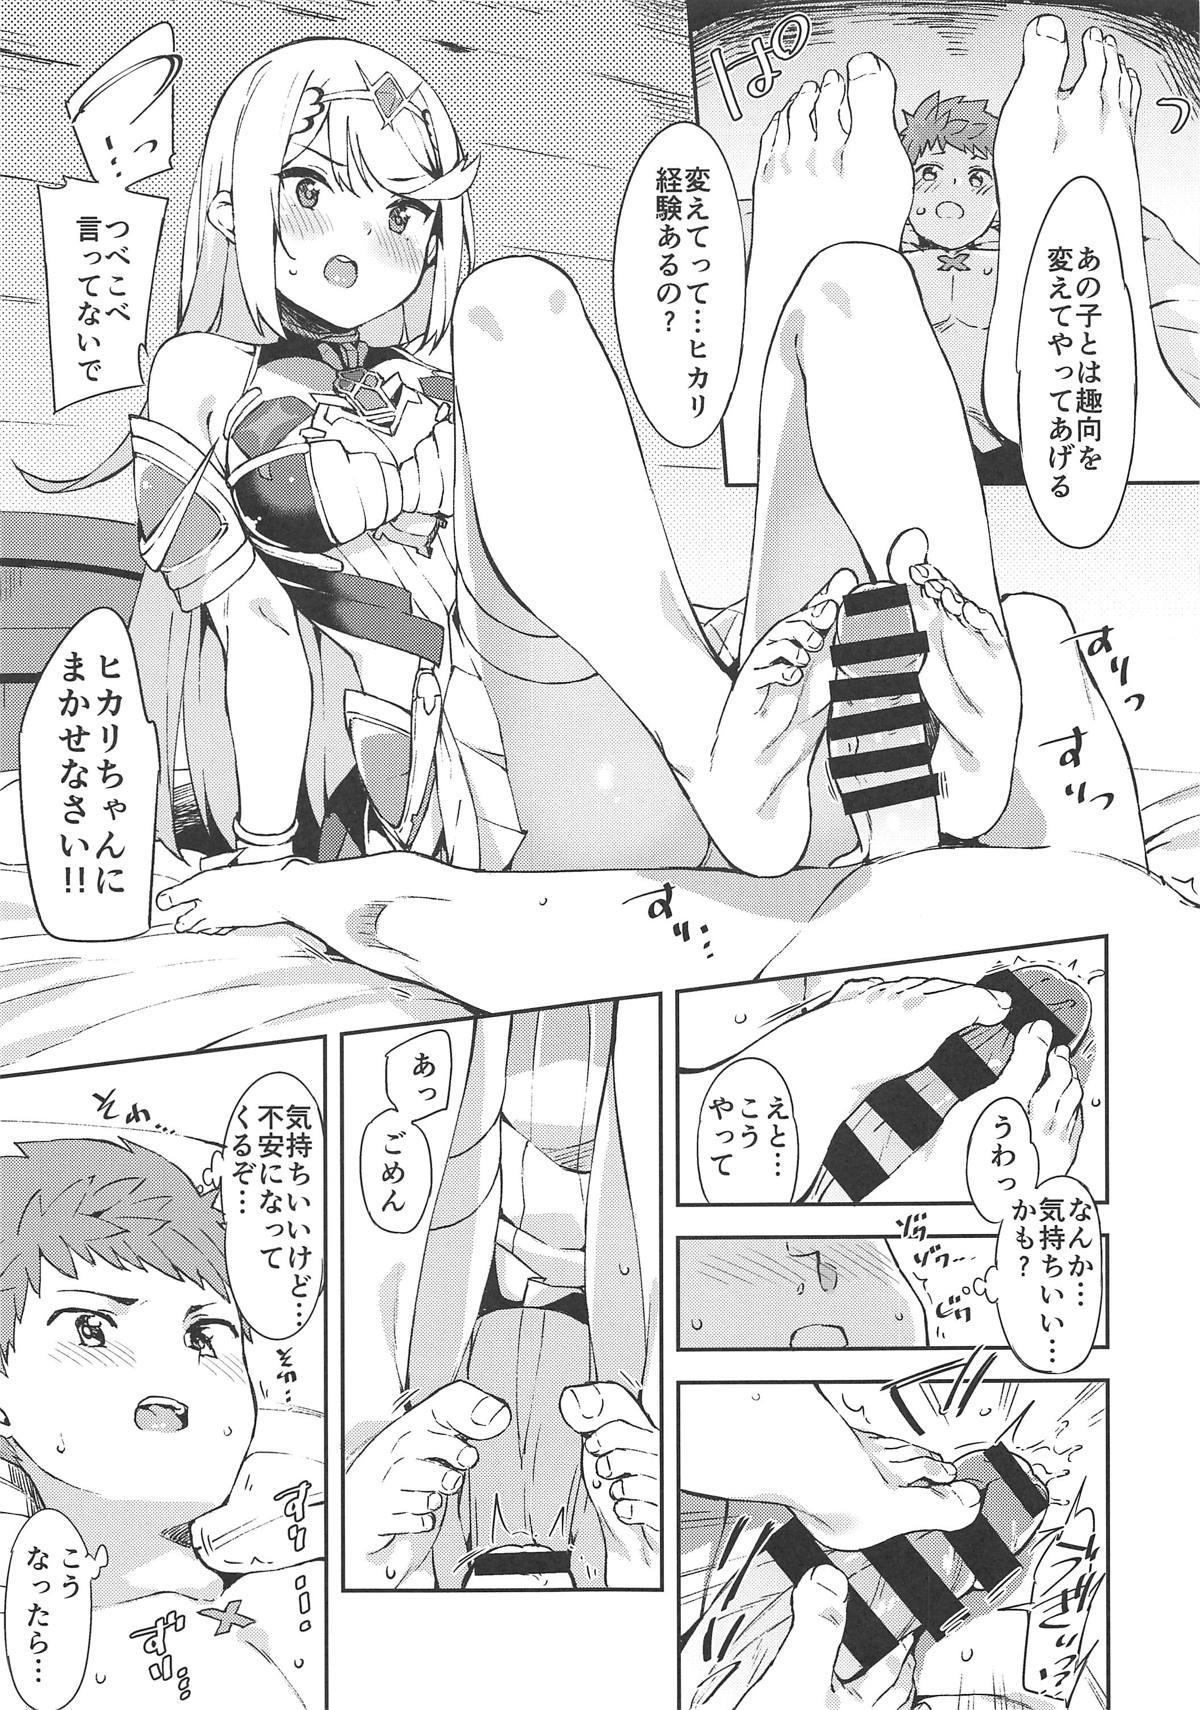 Hikari-chan to Ecchi 7